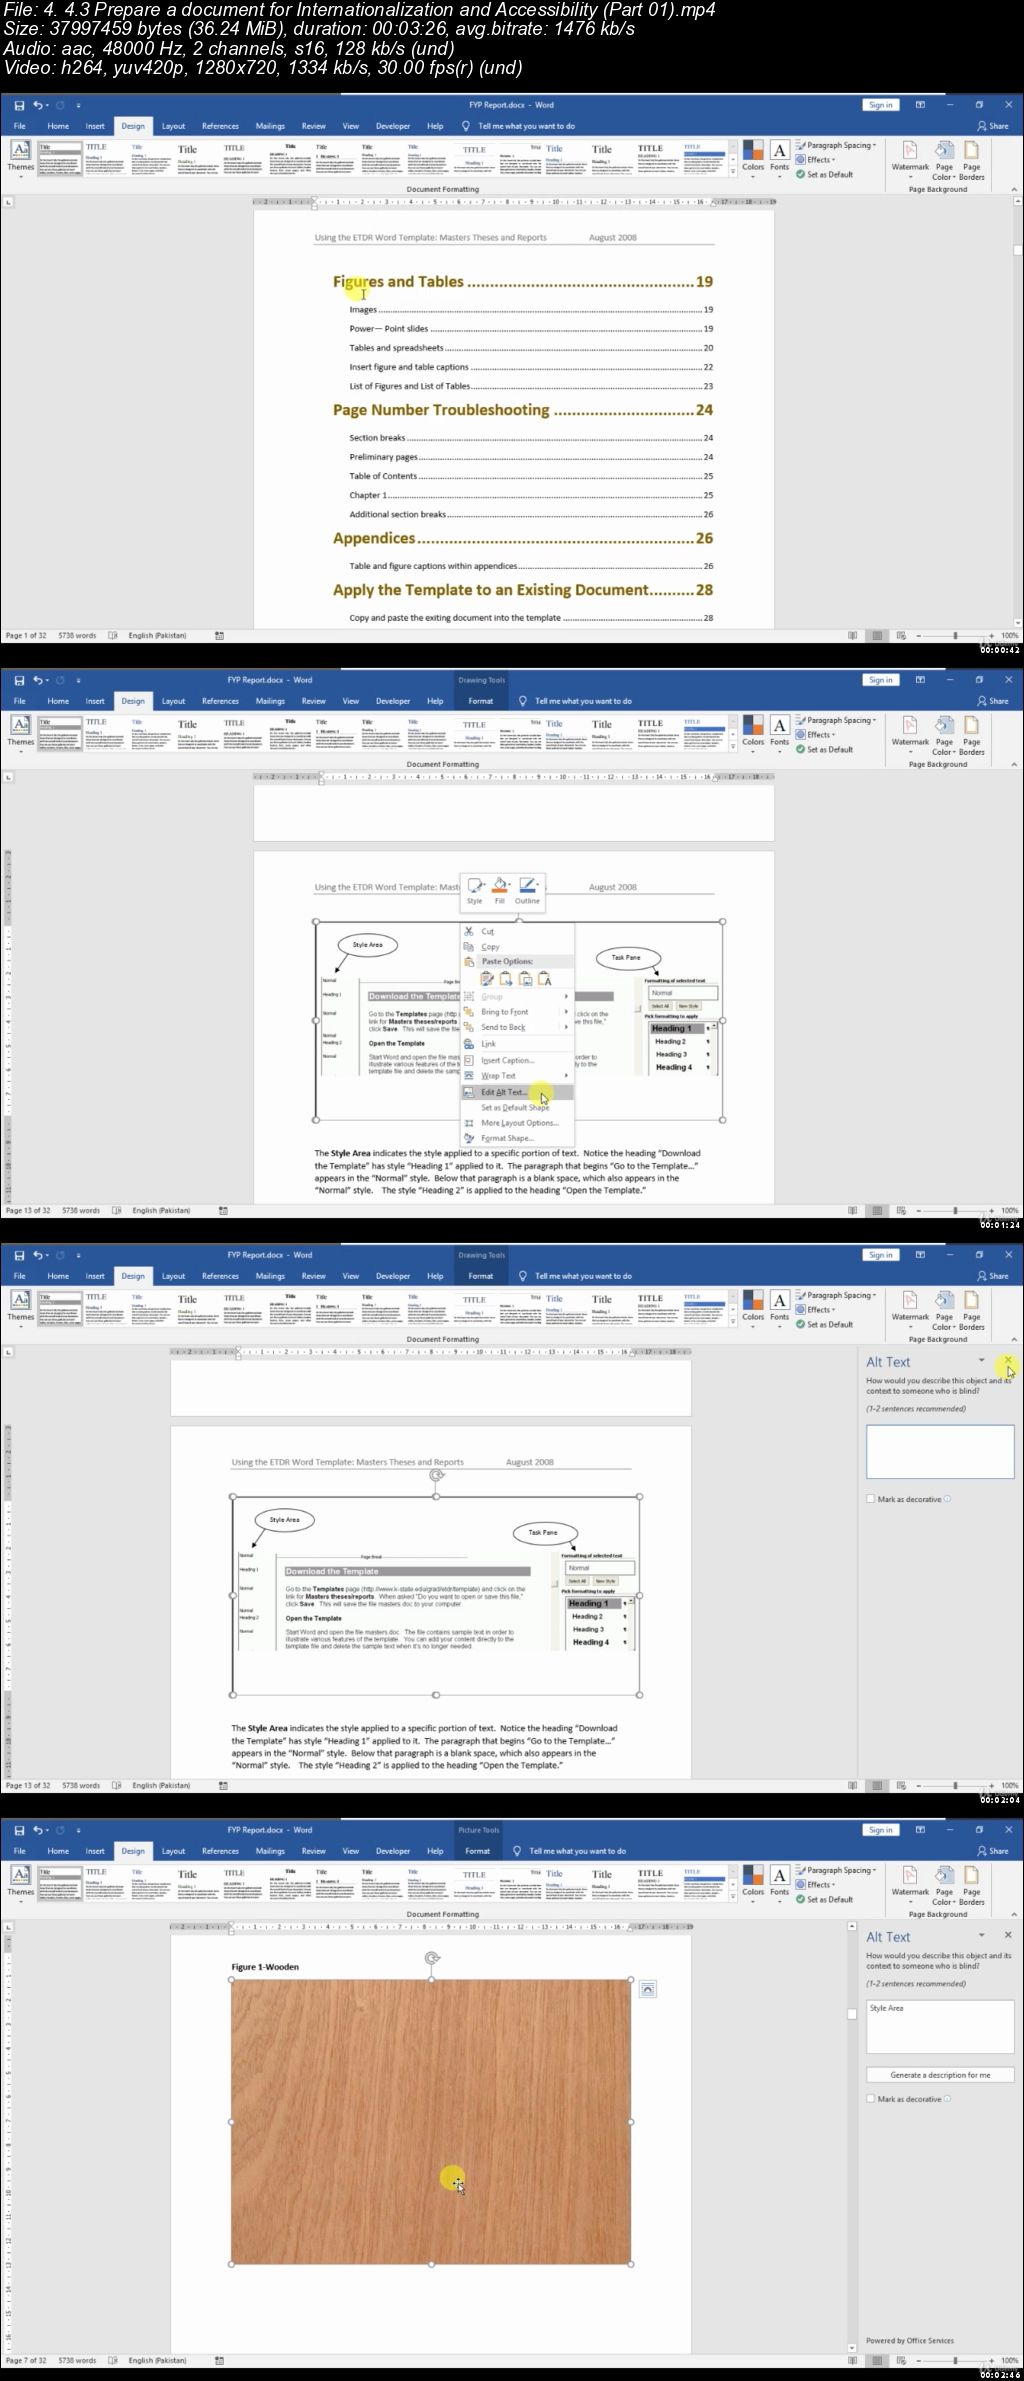 MOS WORD EXPERT 77-726 Exam Preparation (Solution Based)